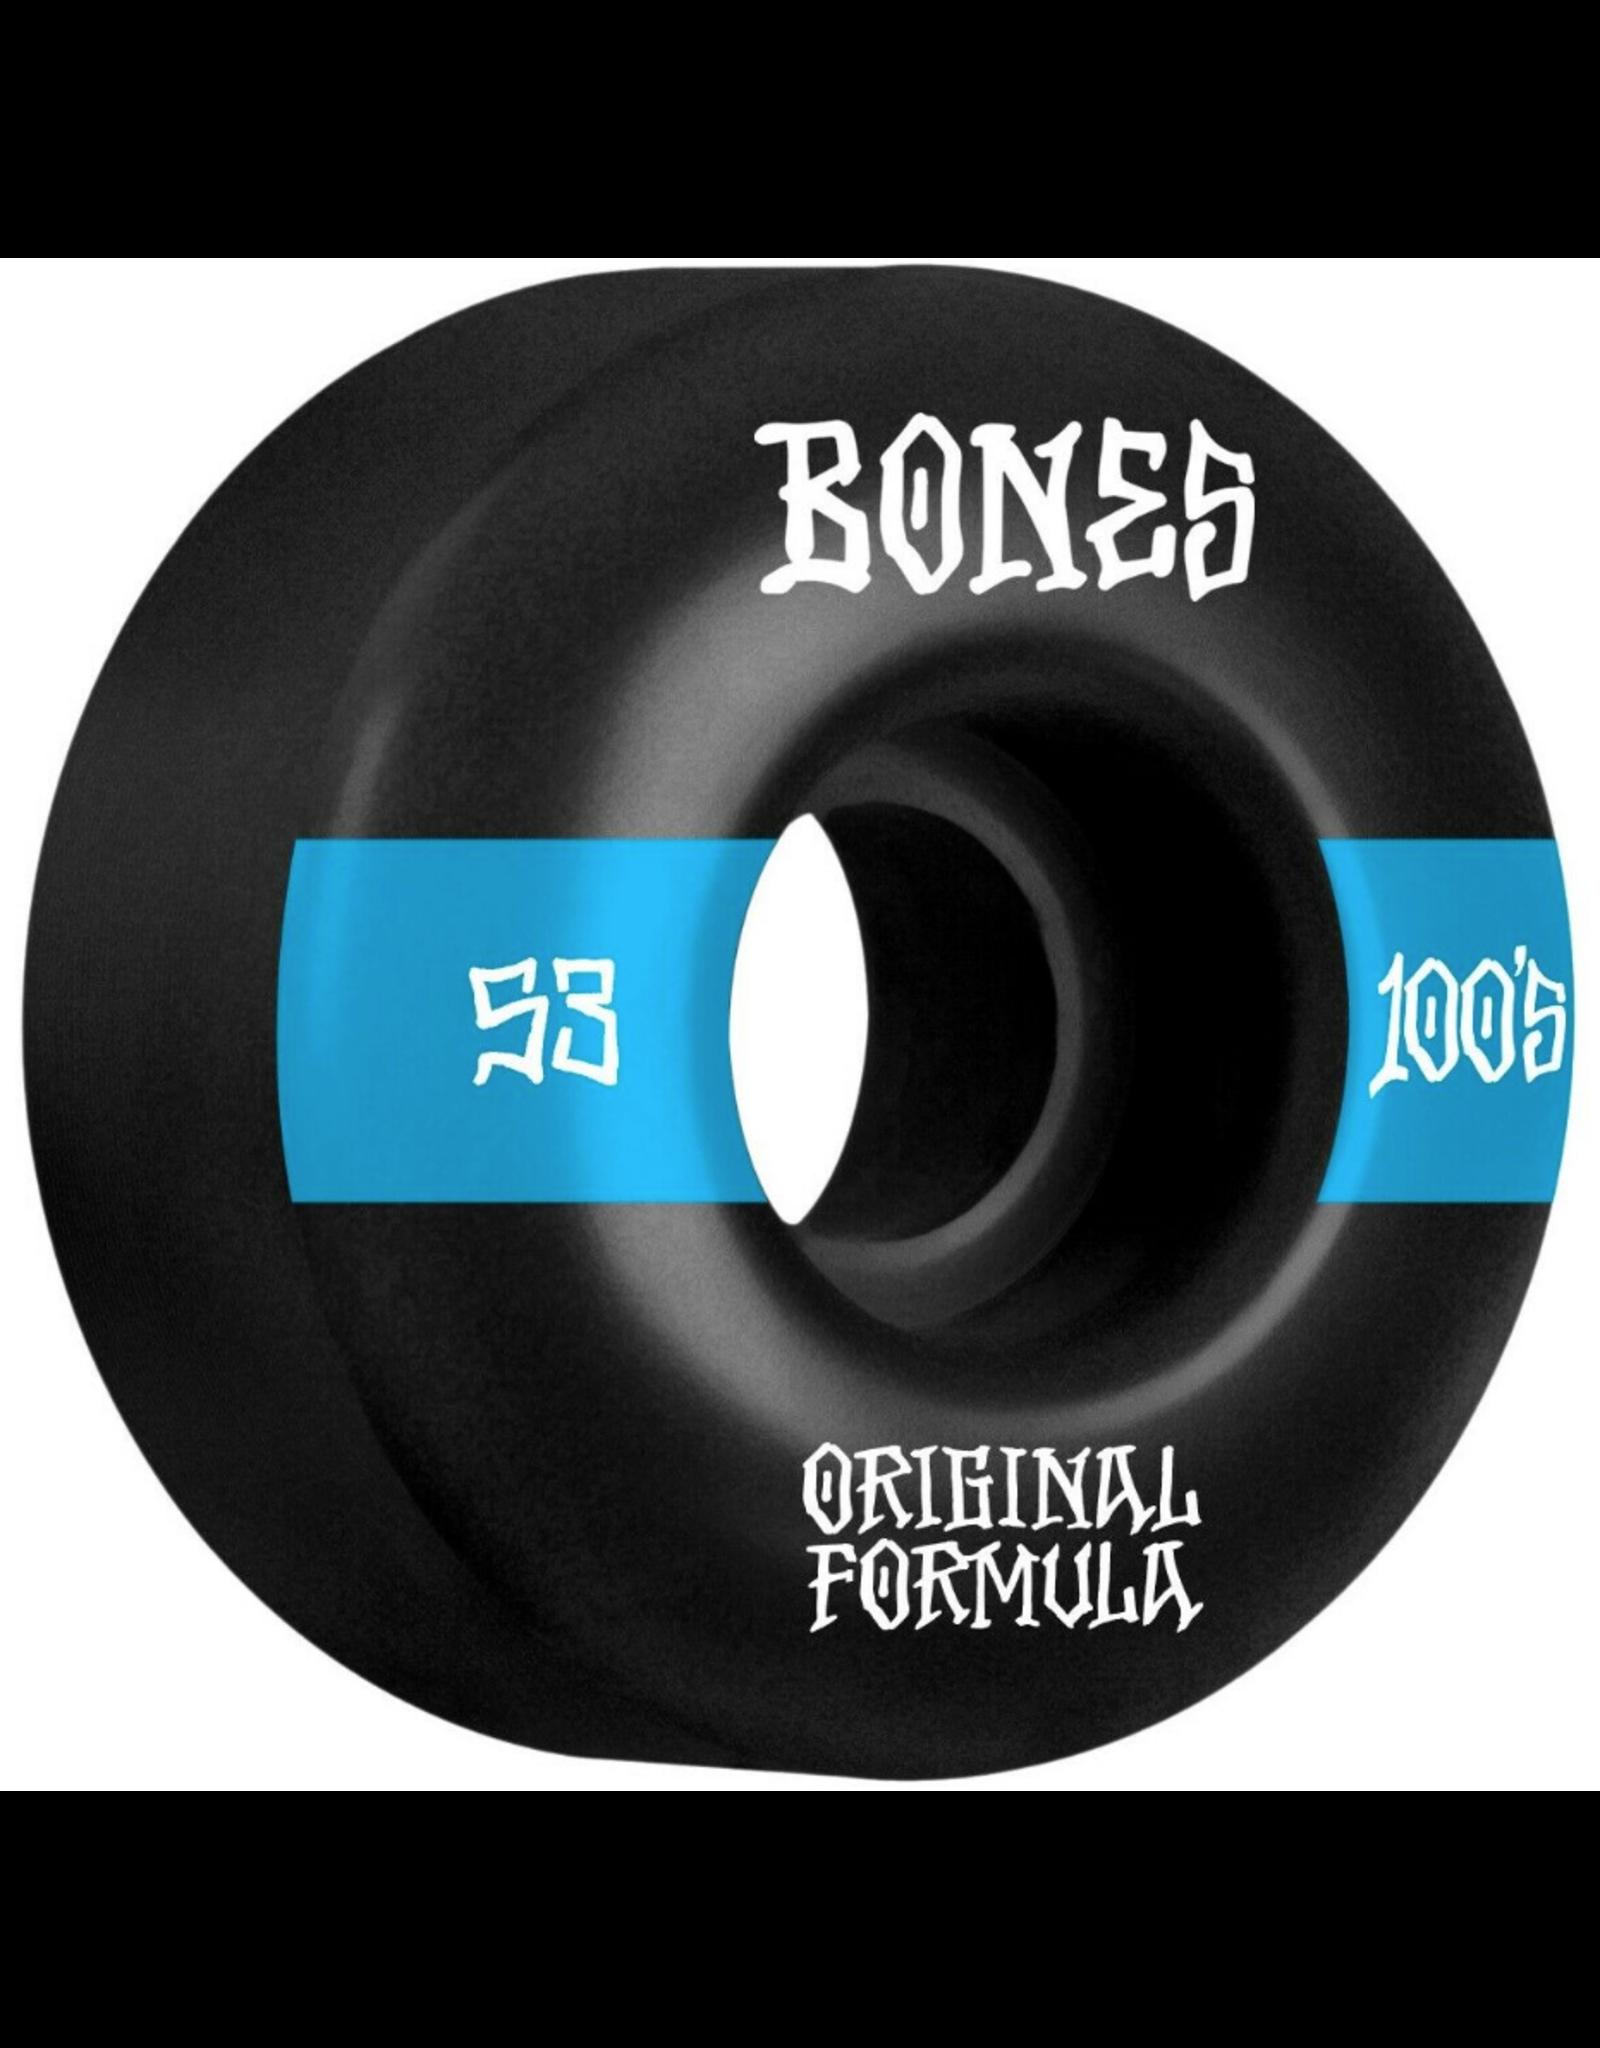 Bones Price Point V4 Wides 100's - Various Sizes Black